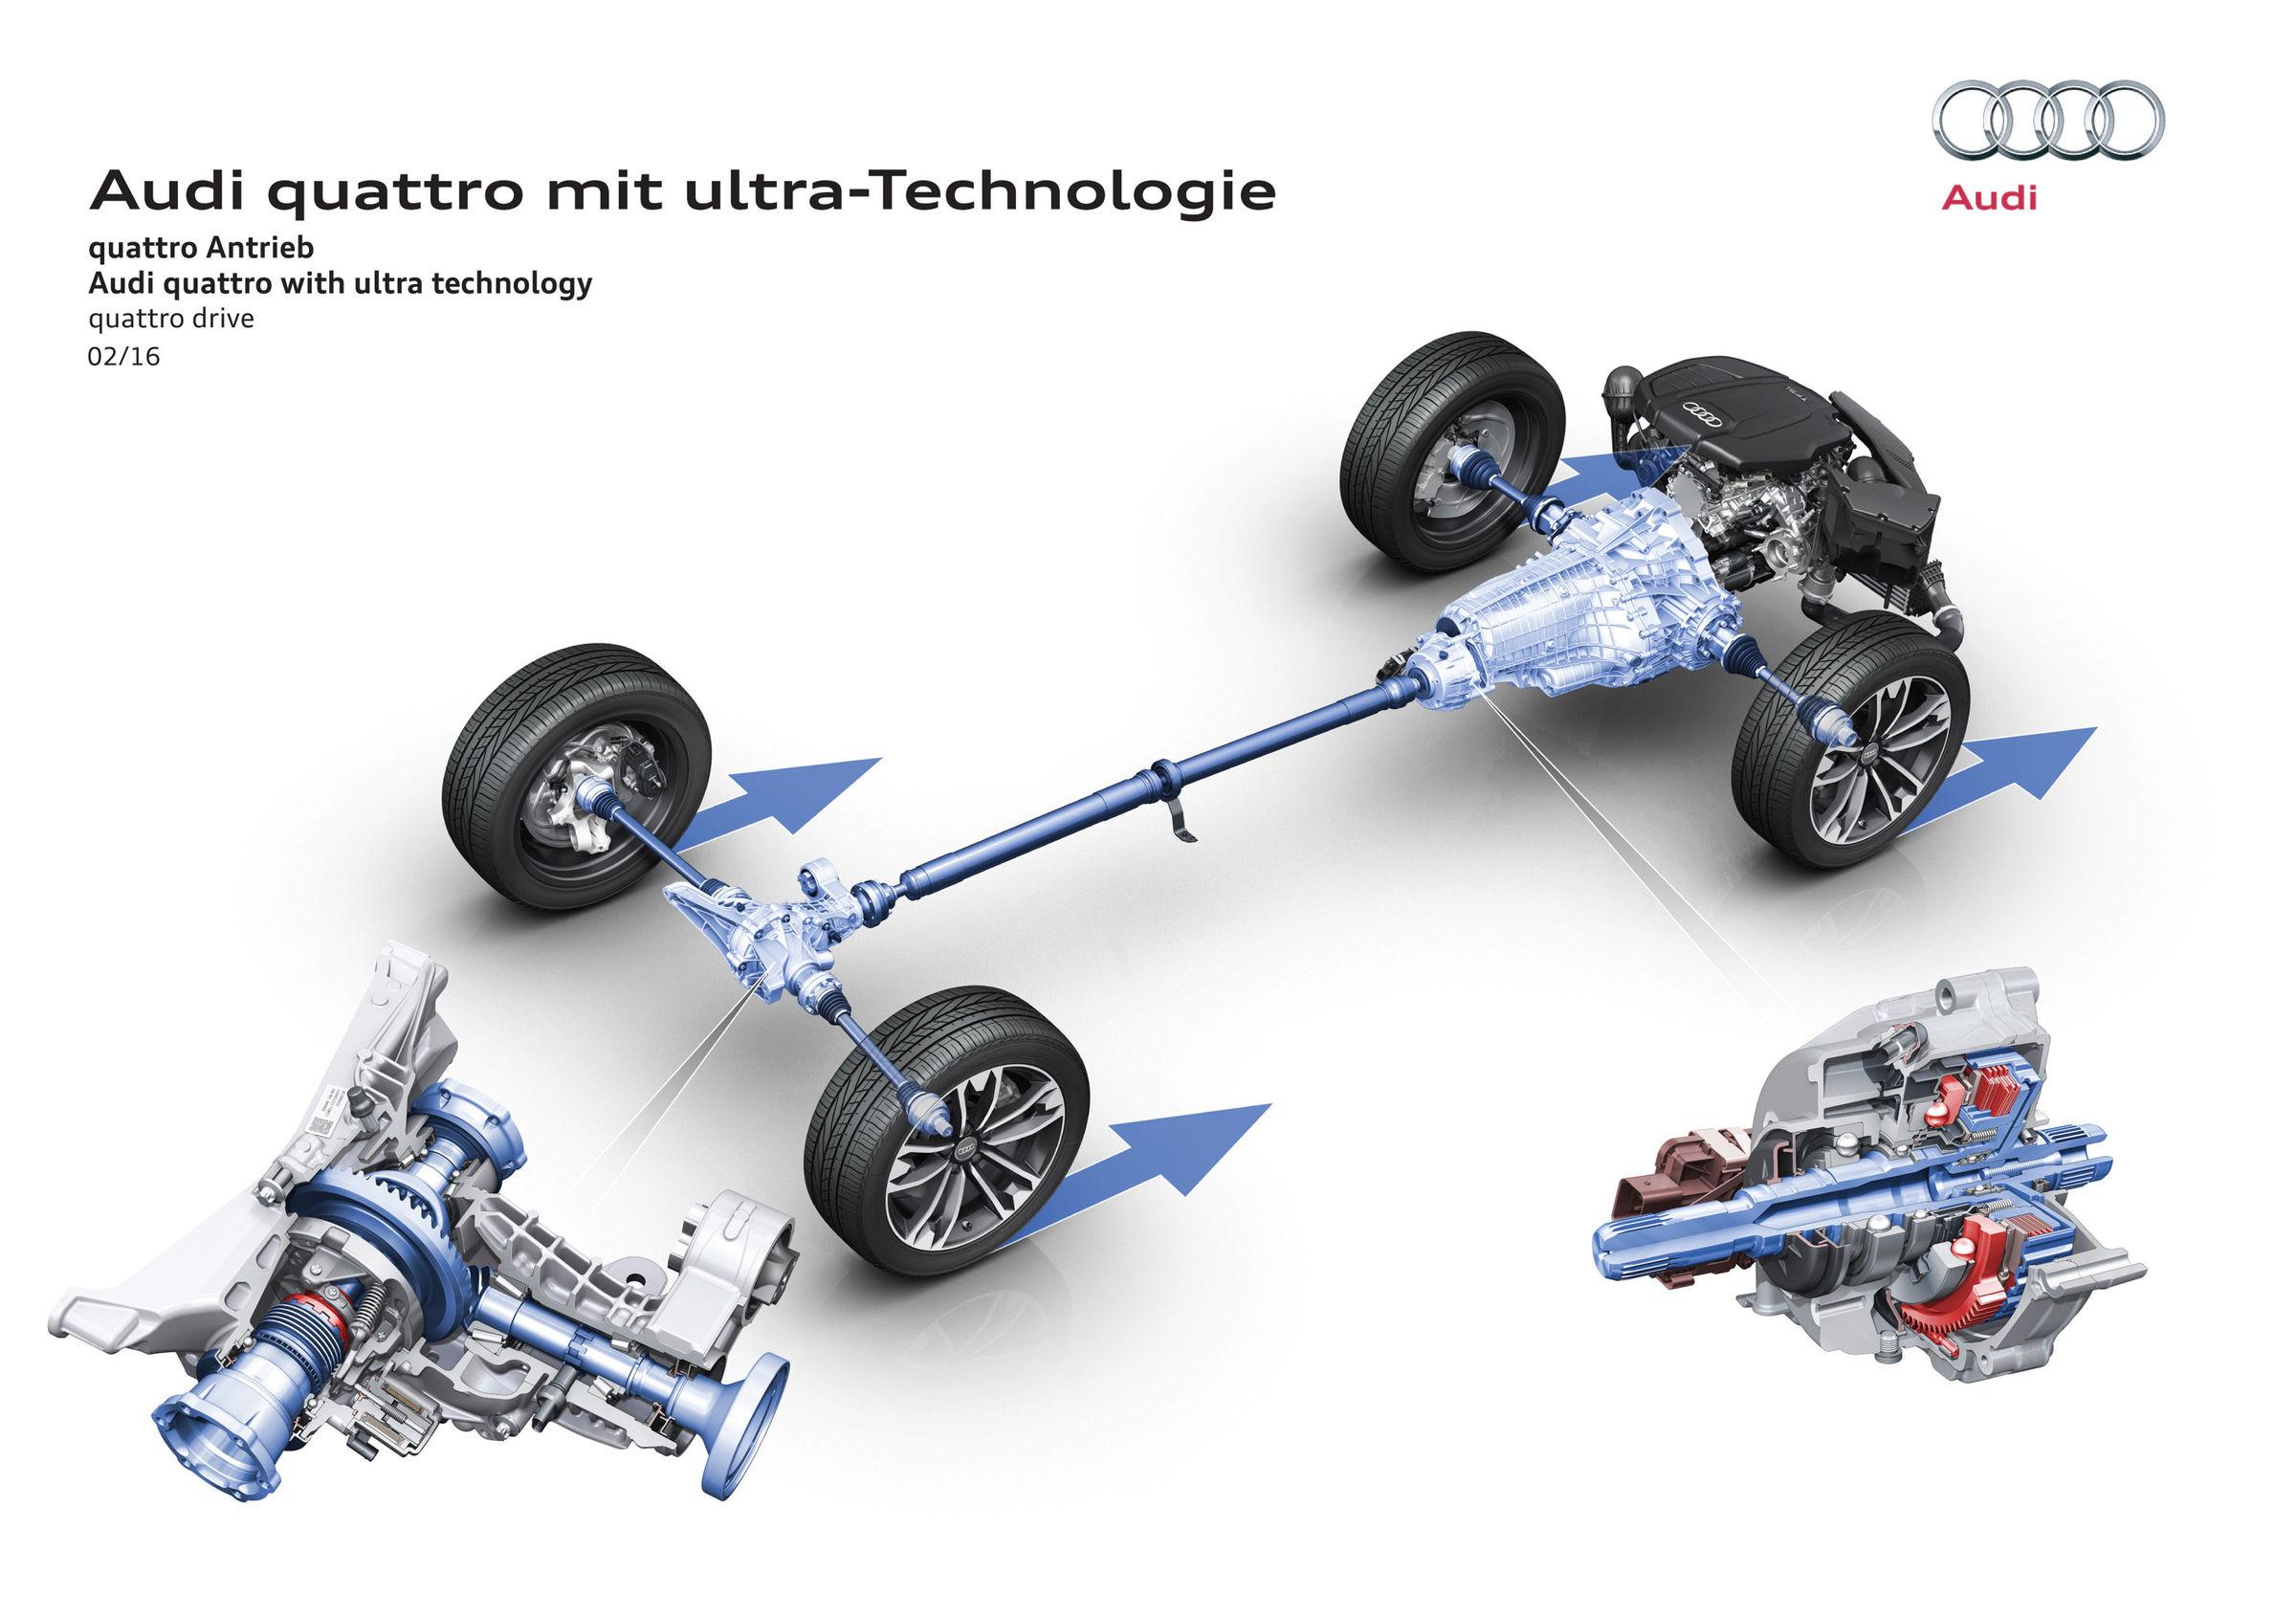 Audi quattro mit ultra-Technologie